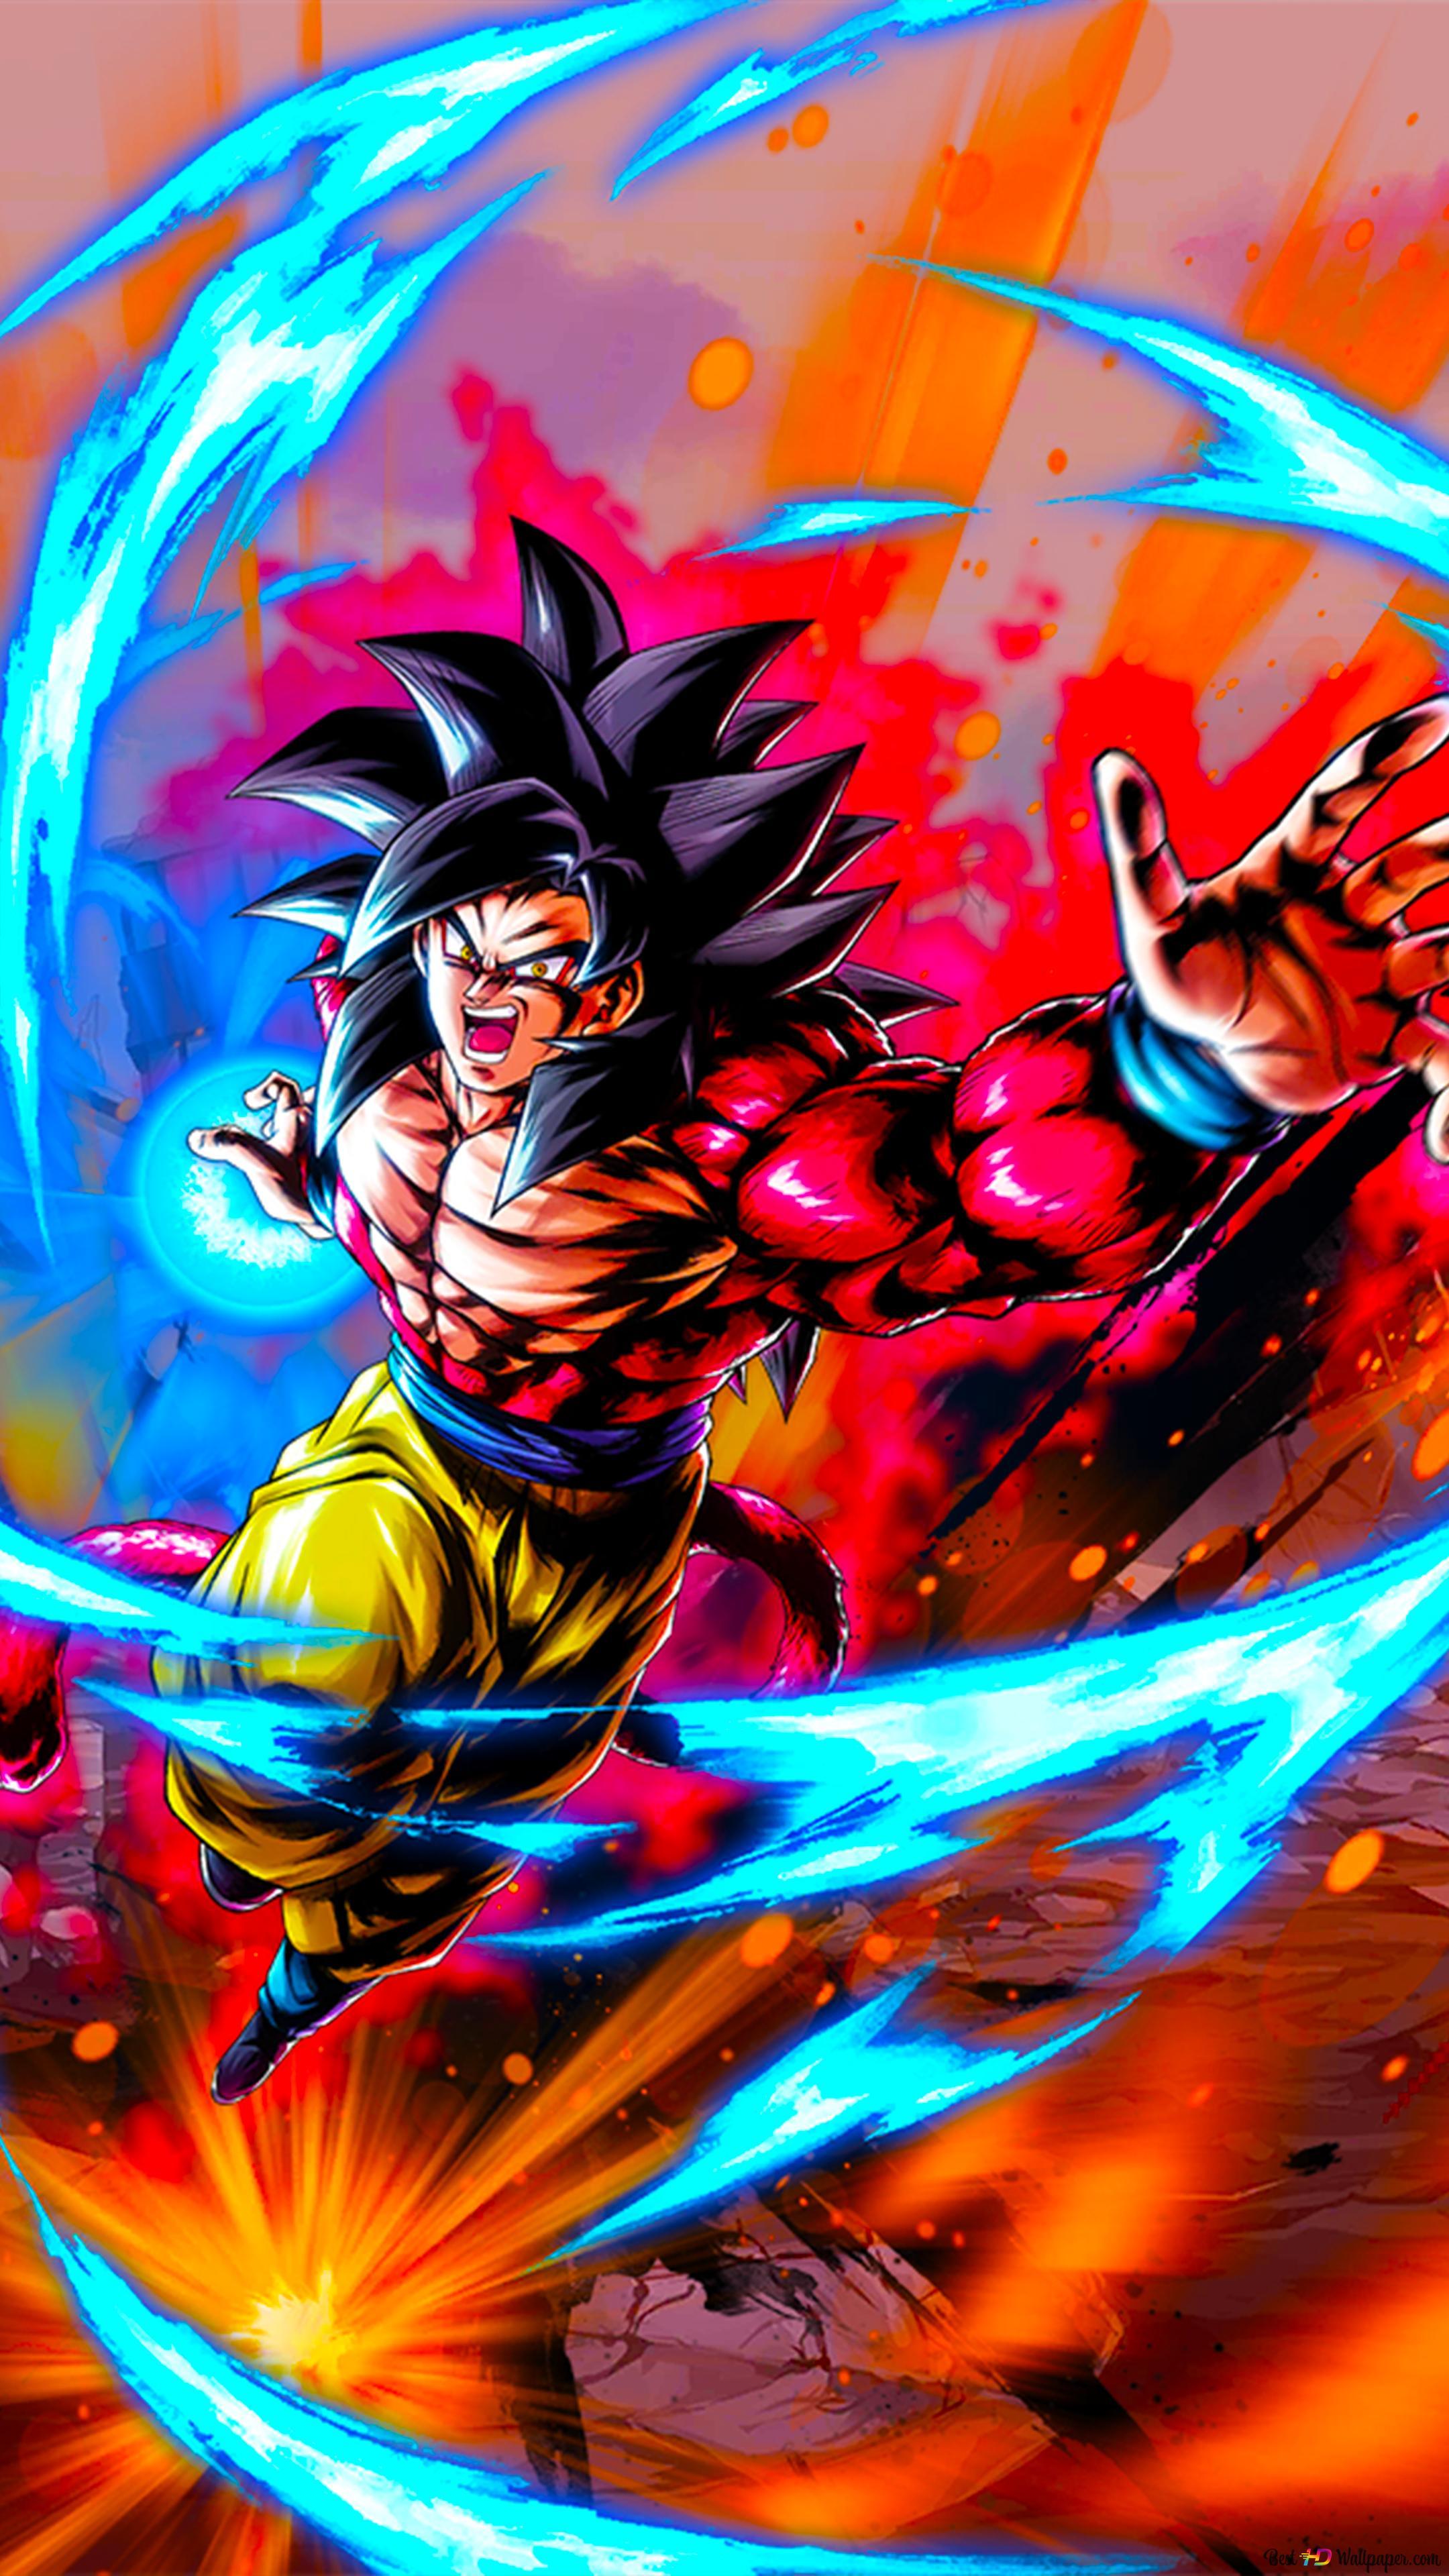 Seni Super Saiyan 4 Goku Dragon Ball Gt Dari Dragon Ball Legends Android Iphone Unduhan Wallpaper Hd